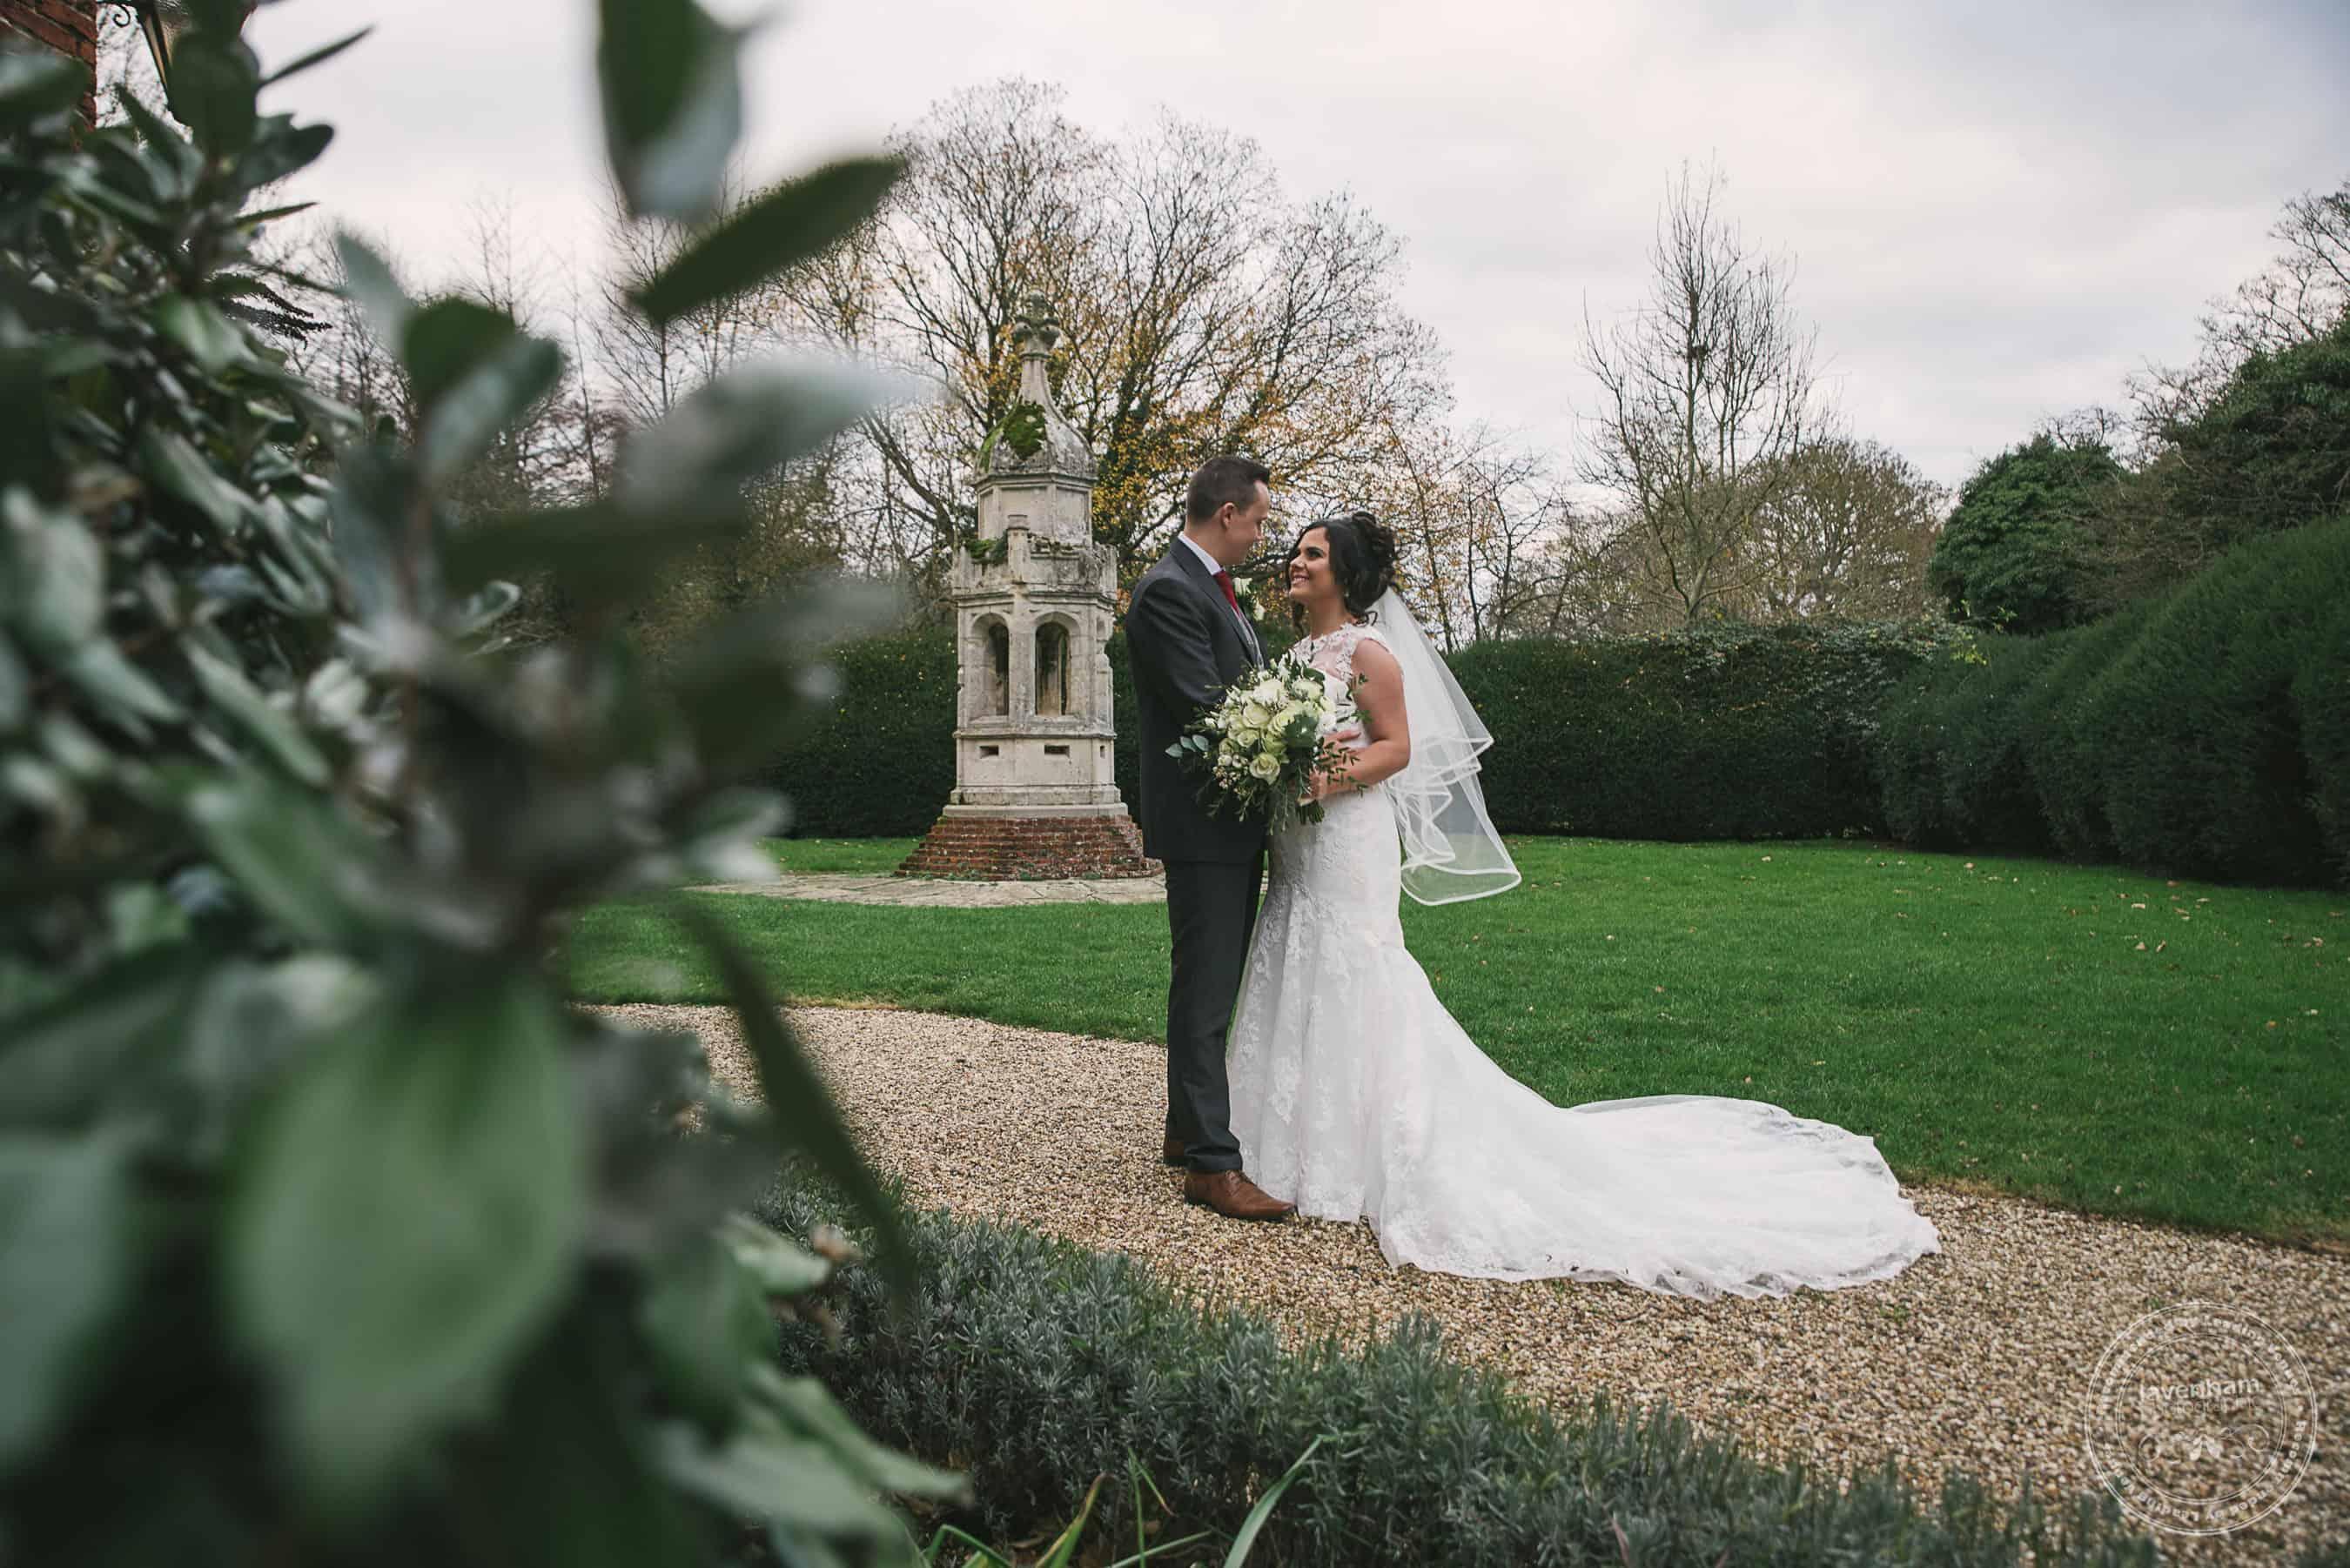 251118 Leez Priory Wedding Photography by Lavenham Photographic 084